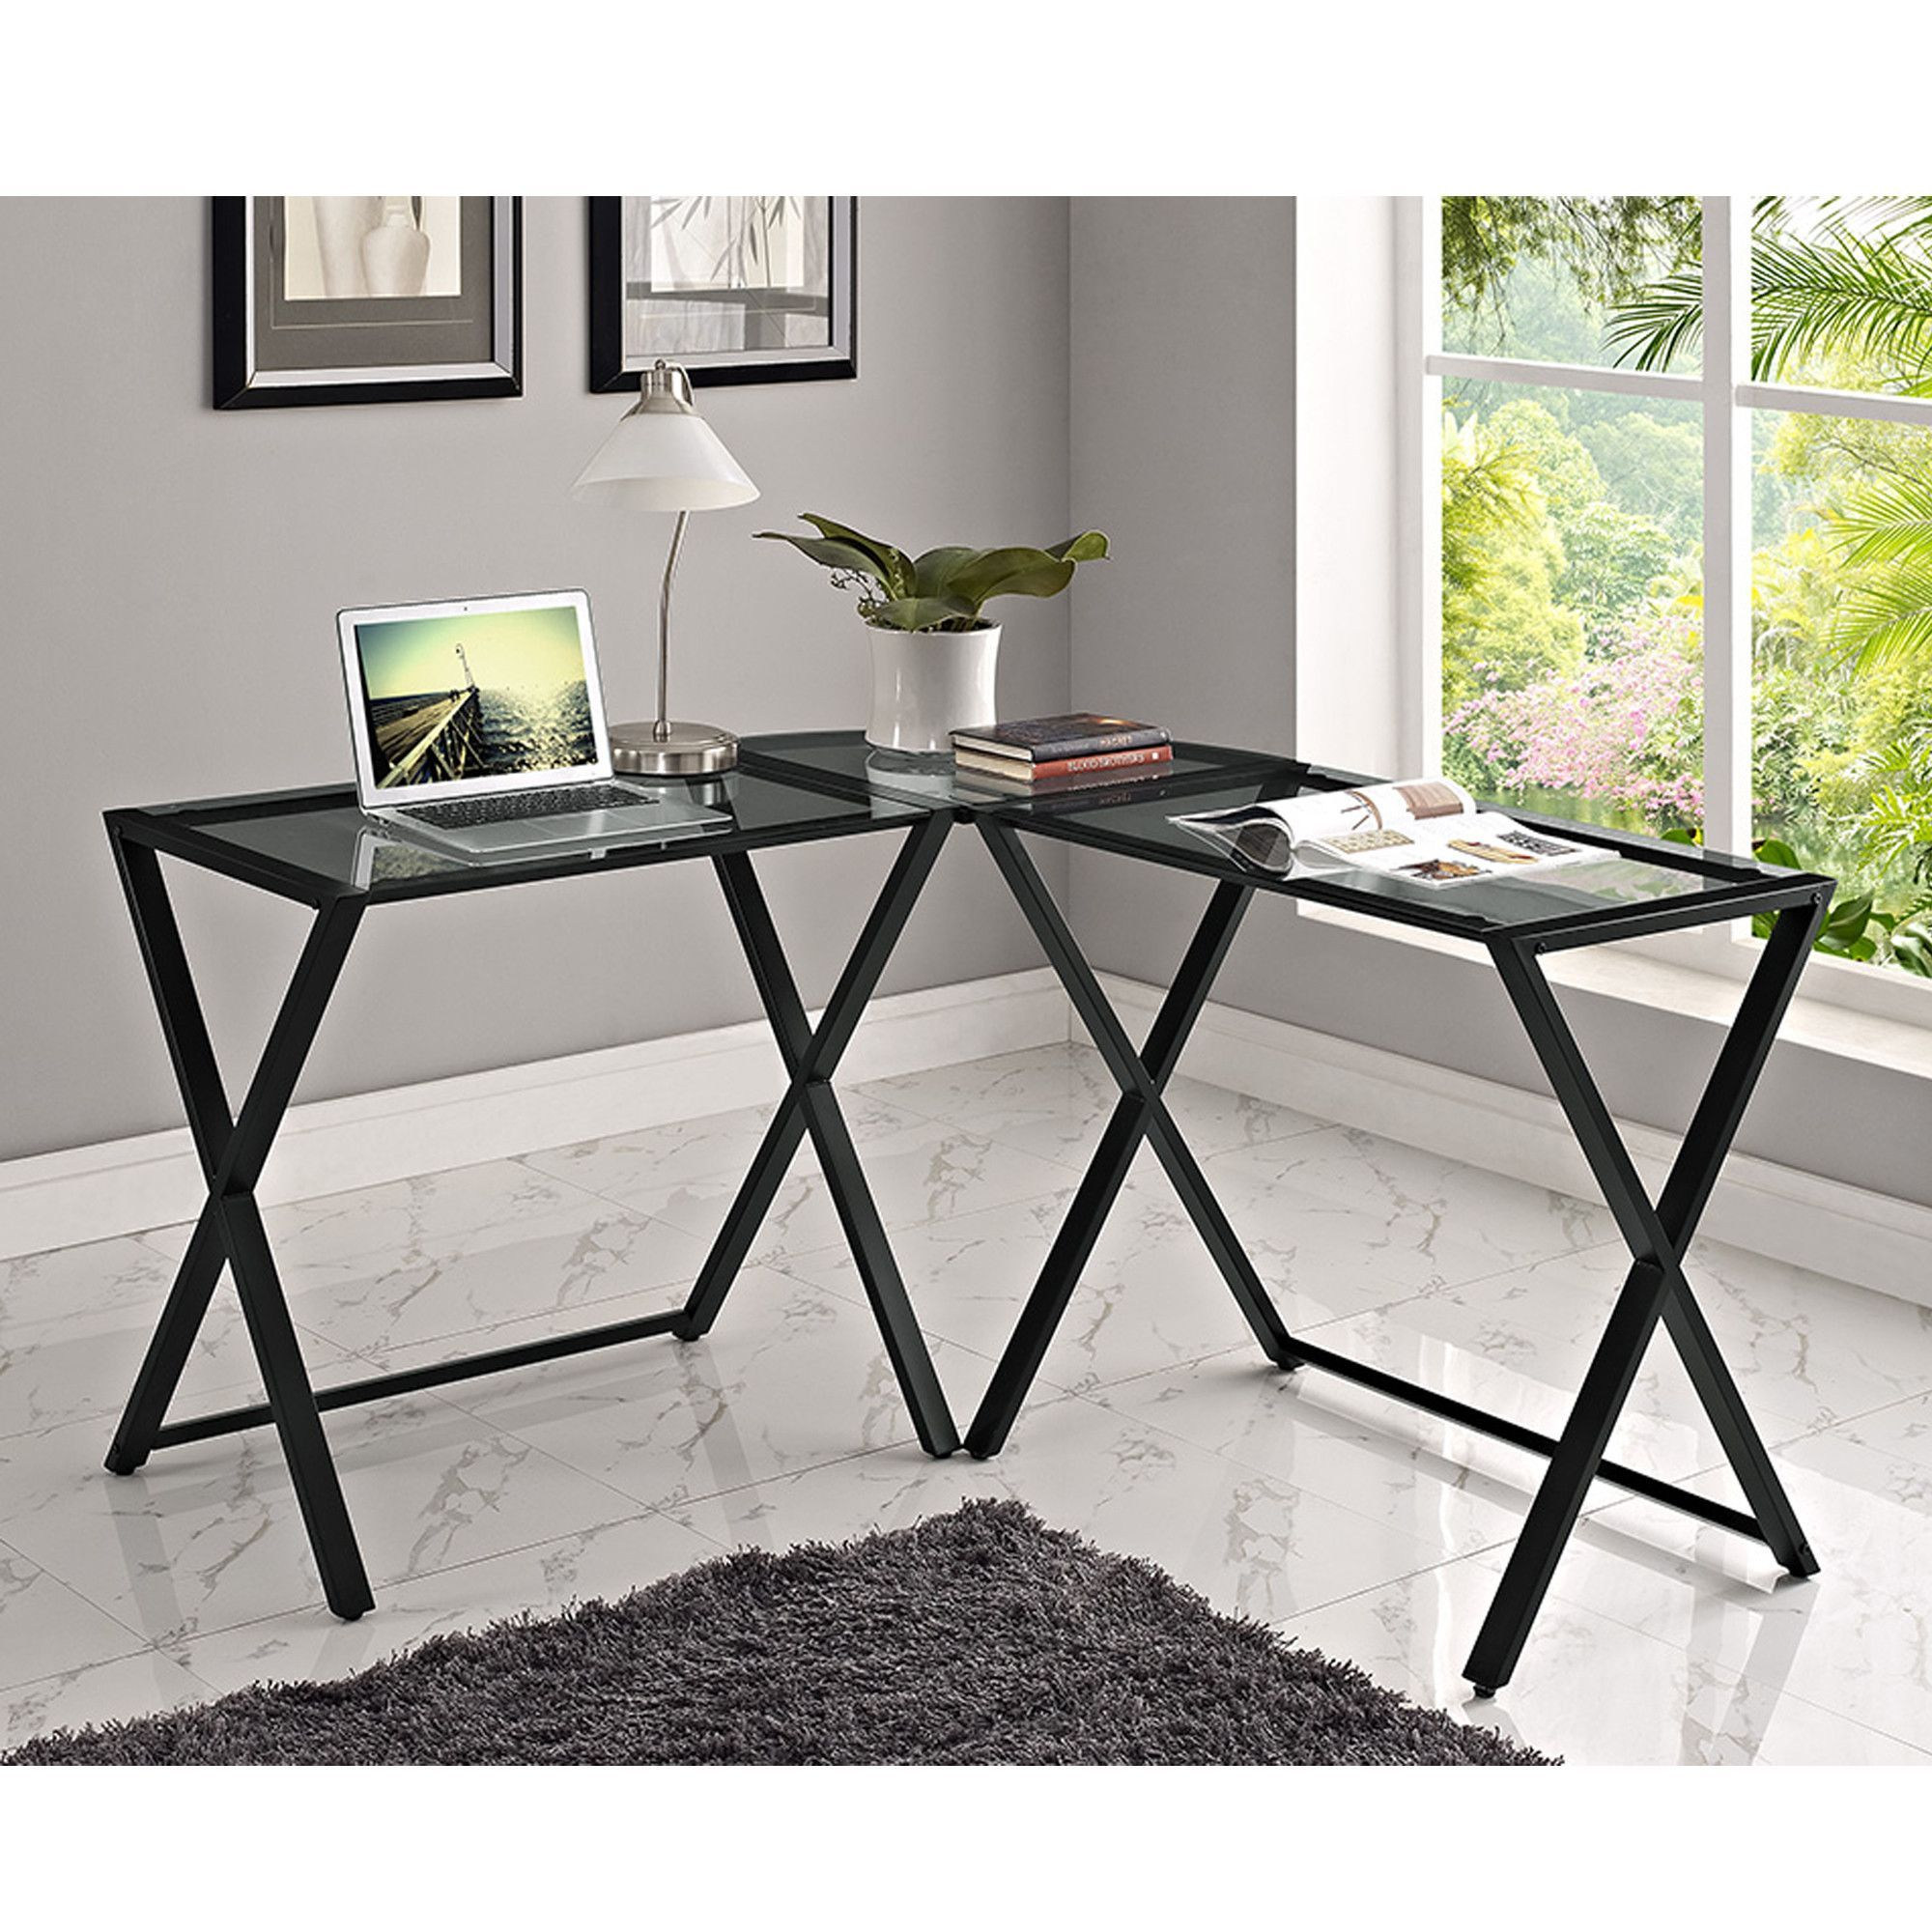 Buy xframe glass u metal lshaped computer desk smokeblack at